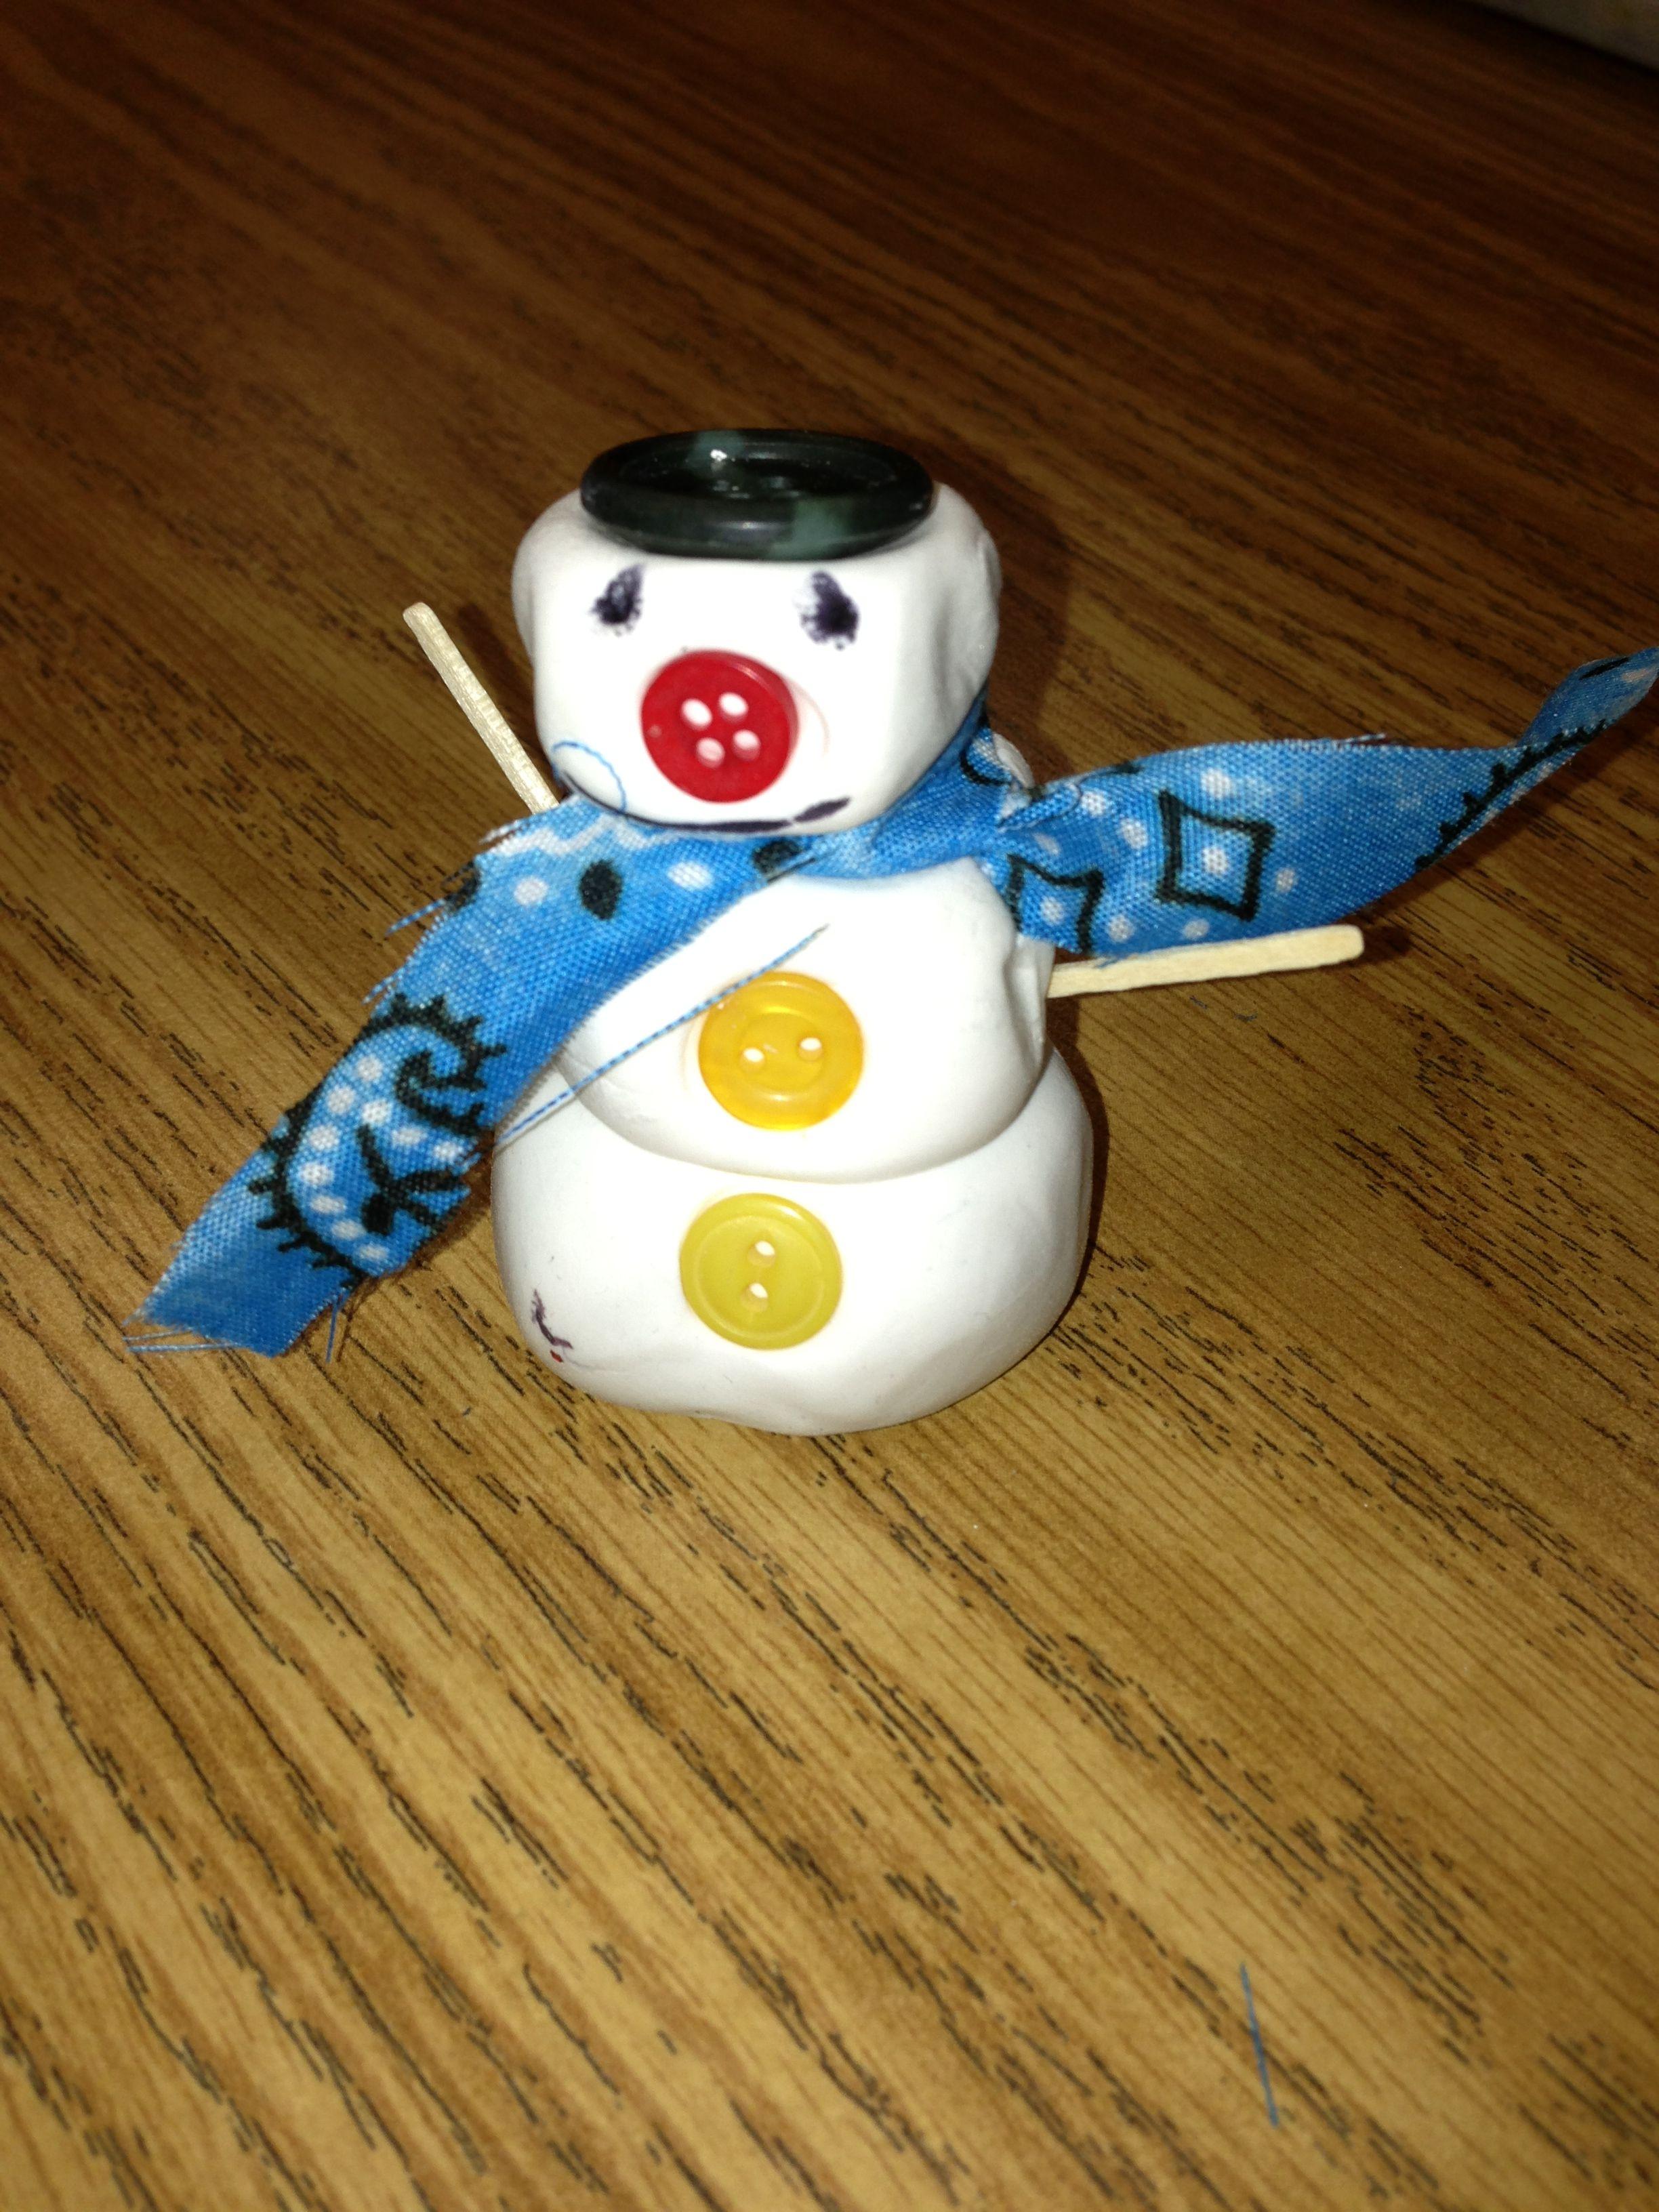 Snowman Sculpture Crayola Air Dry Clay & mixed materials